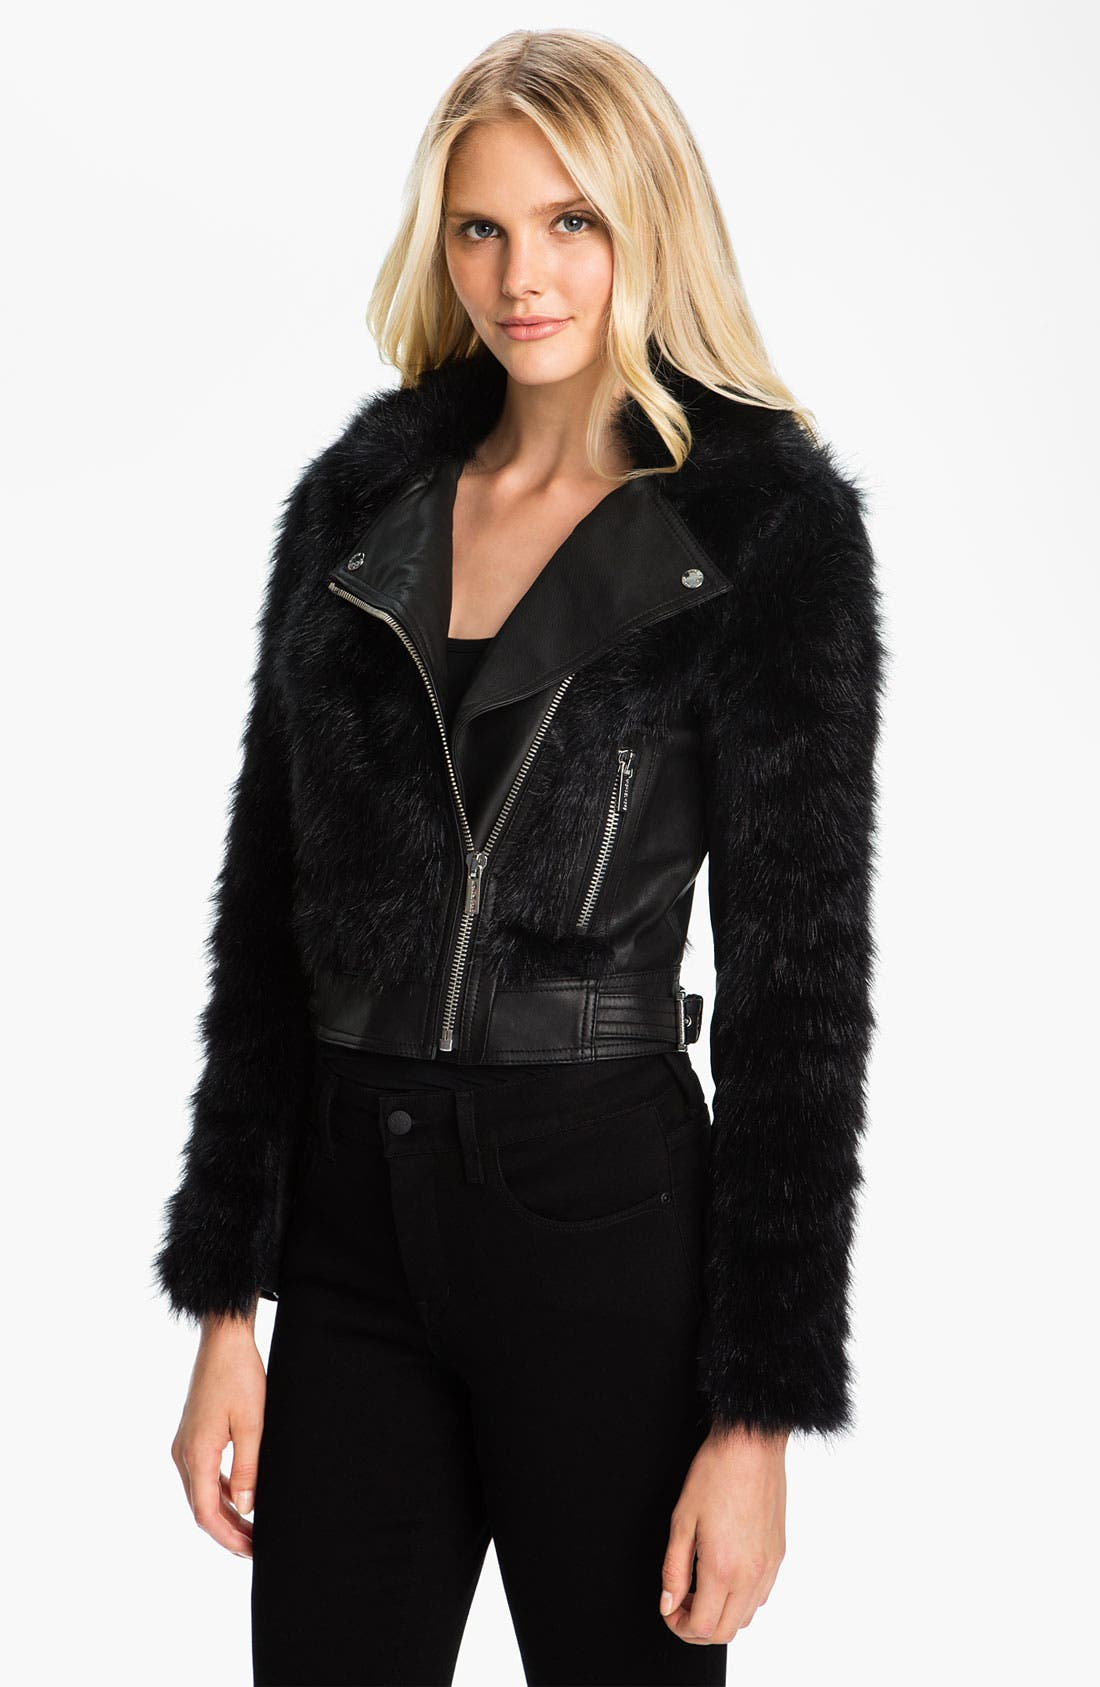 Alternate Image 1 Selected - MICHAEL Michael Kors Faux Fur & Faux Leather Jacket